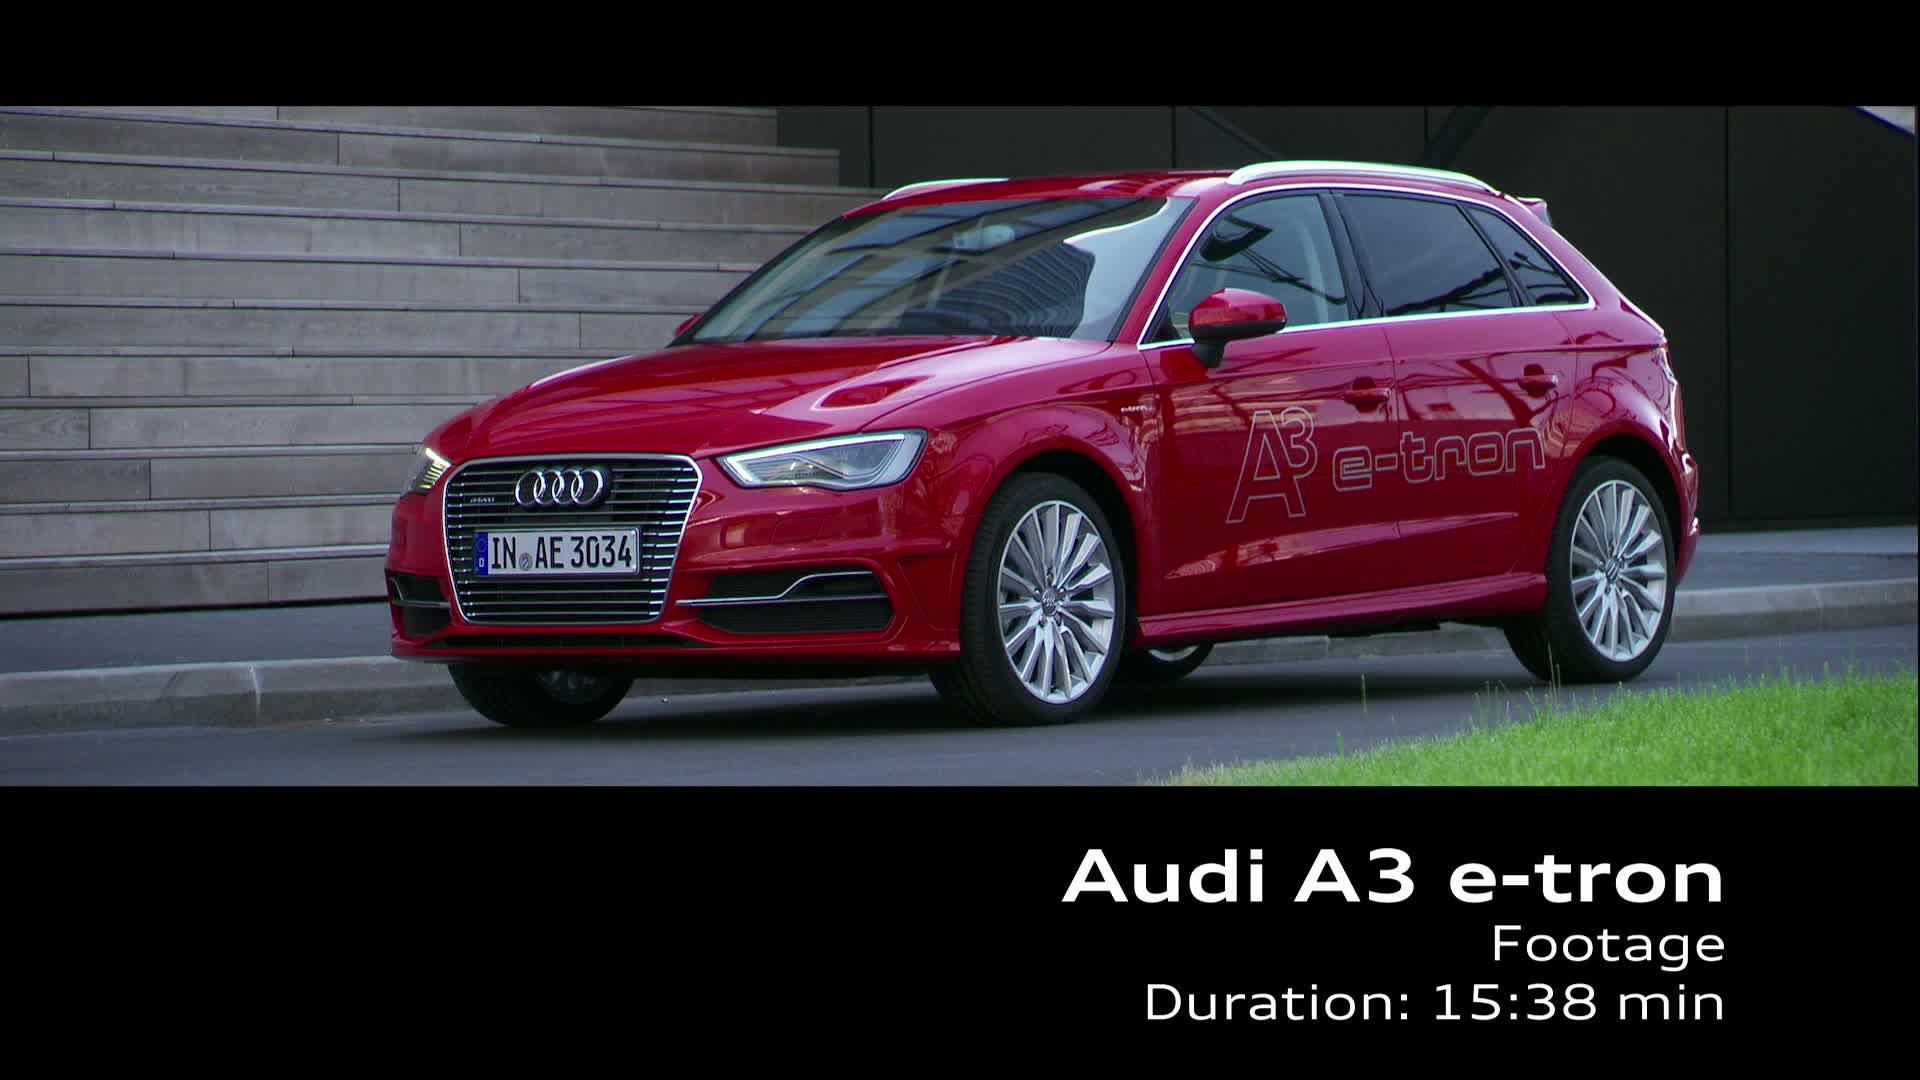 Der Audi A3 Sportback e-tron - Footage